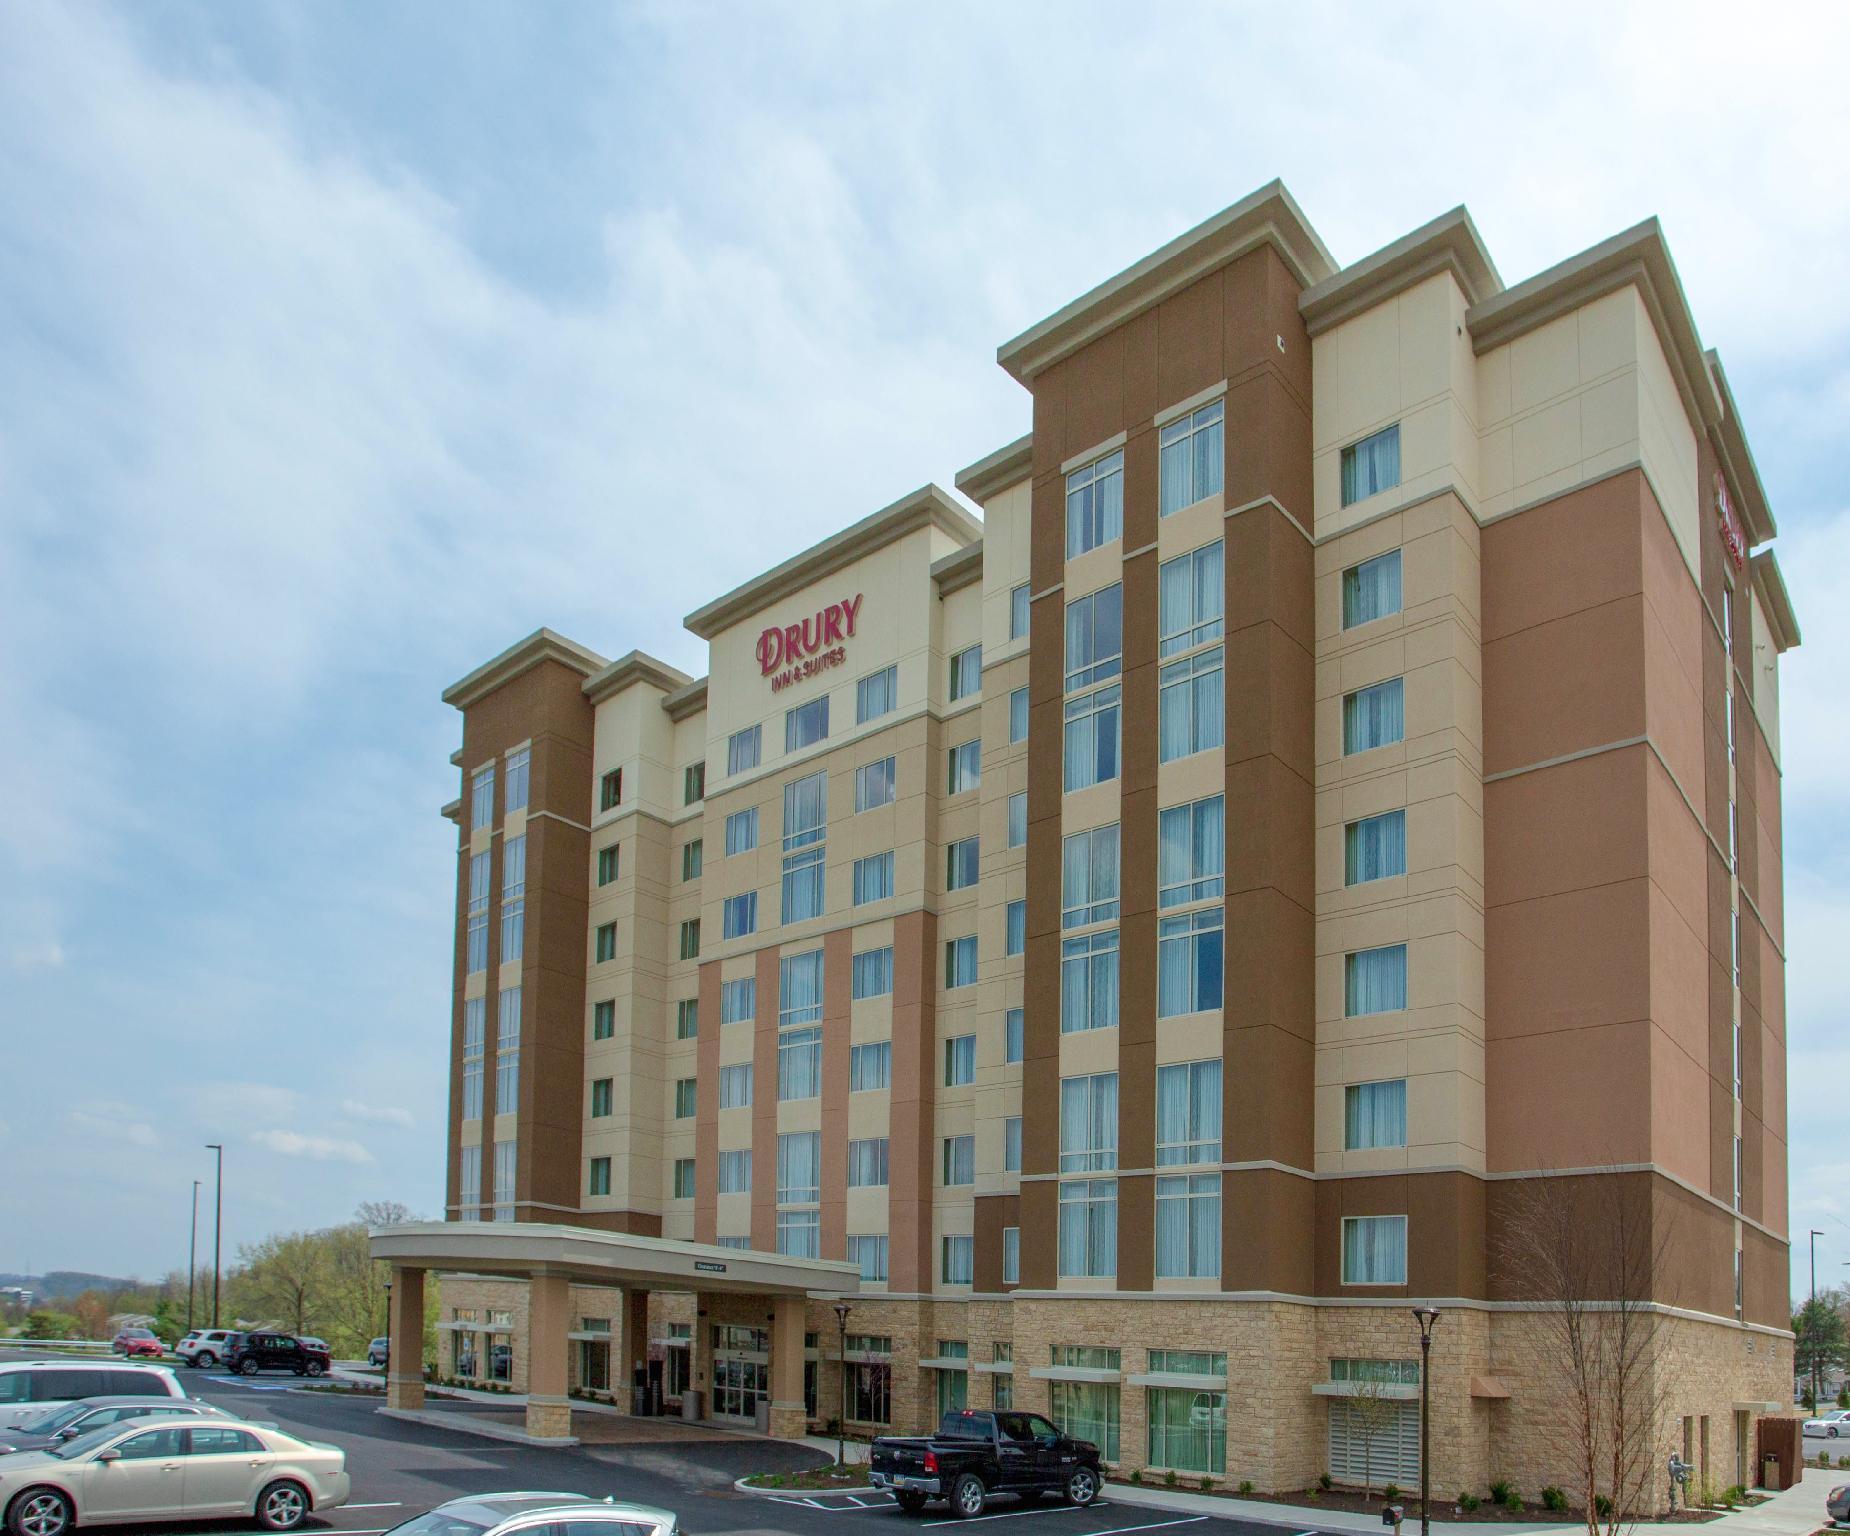 Drury Inn And Suites Pittsburgh Airport Settlers Ridge